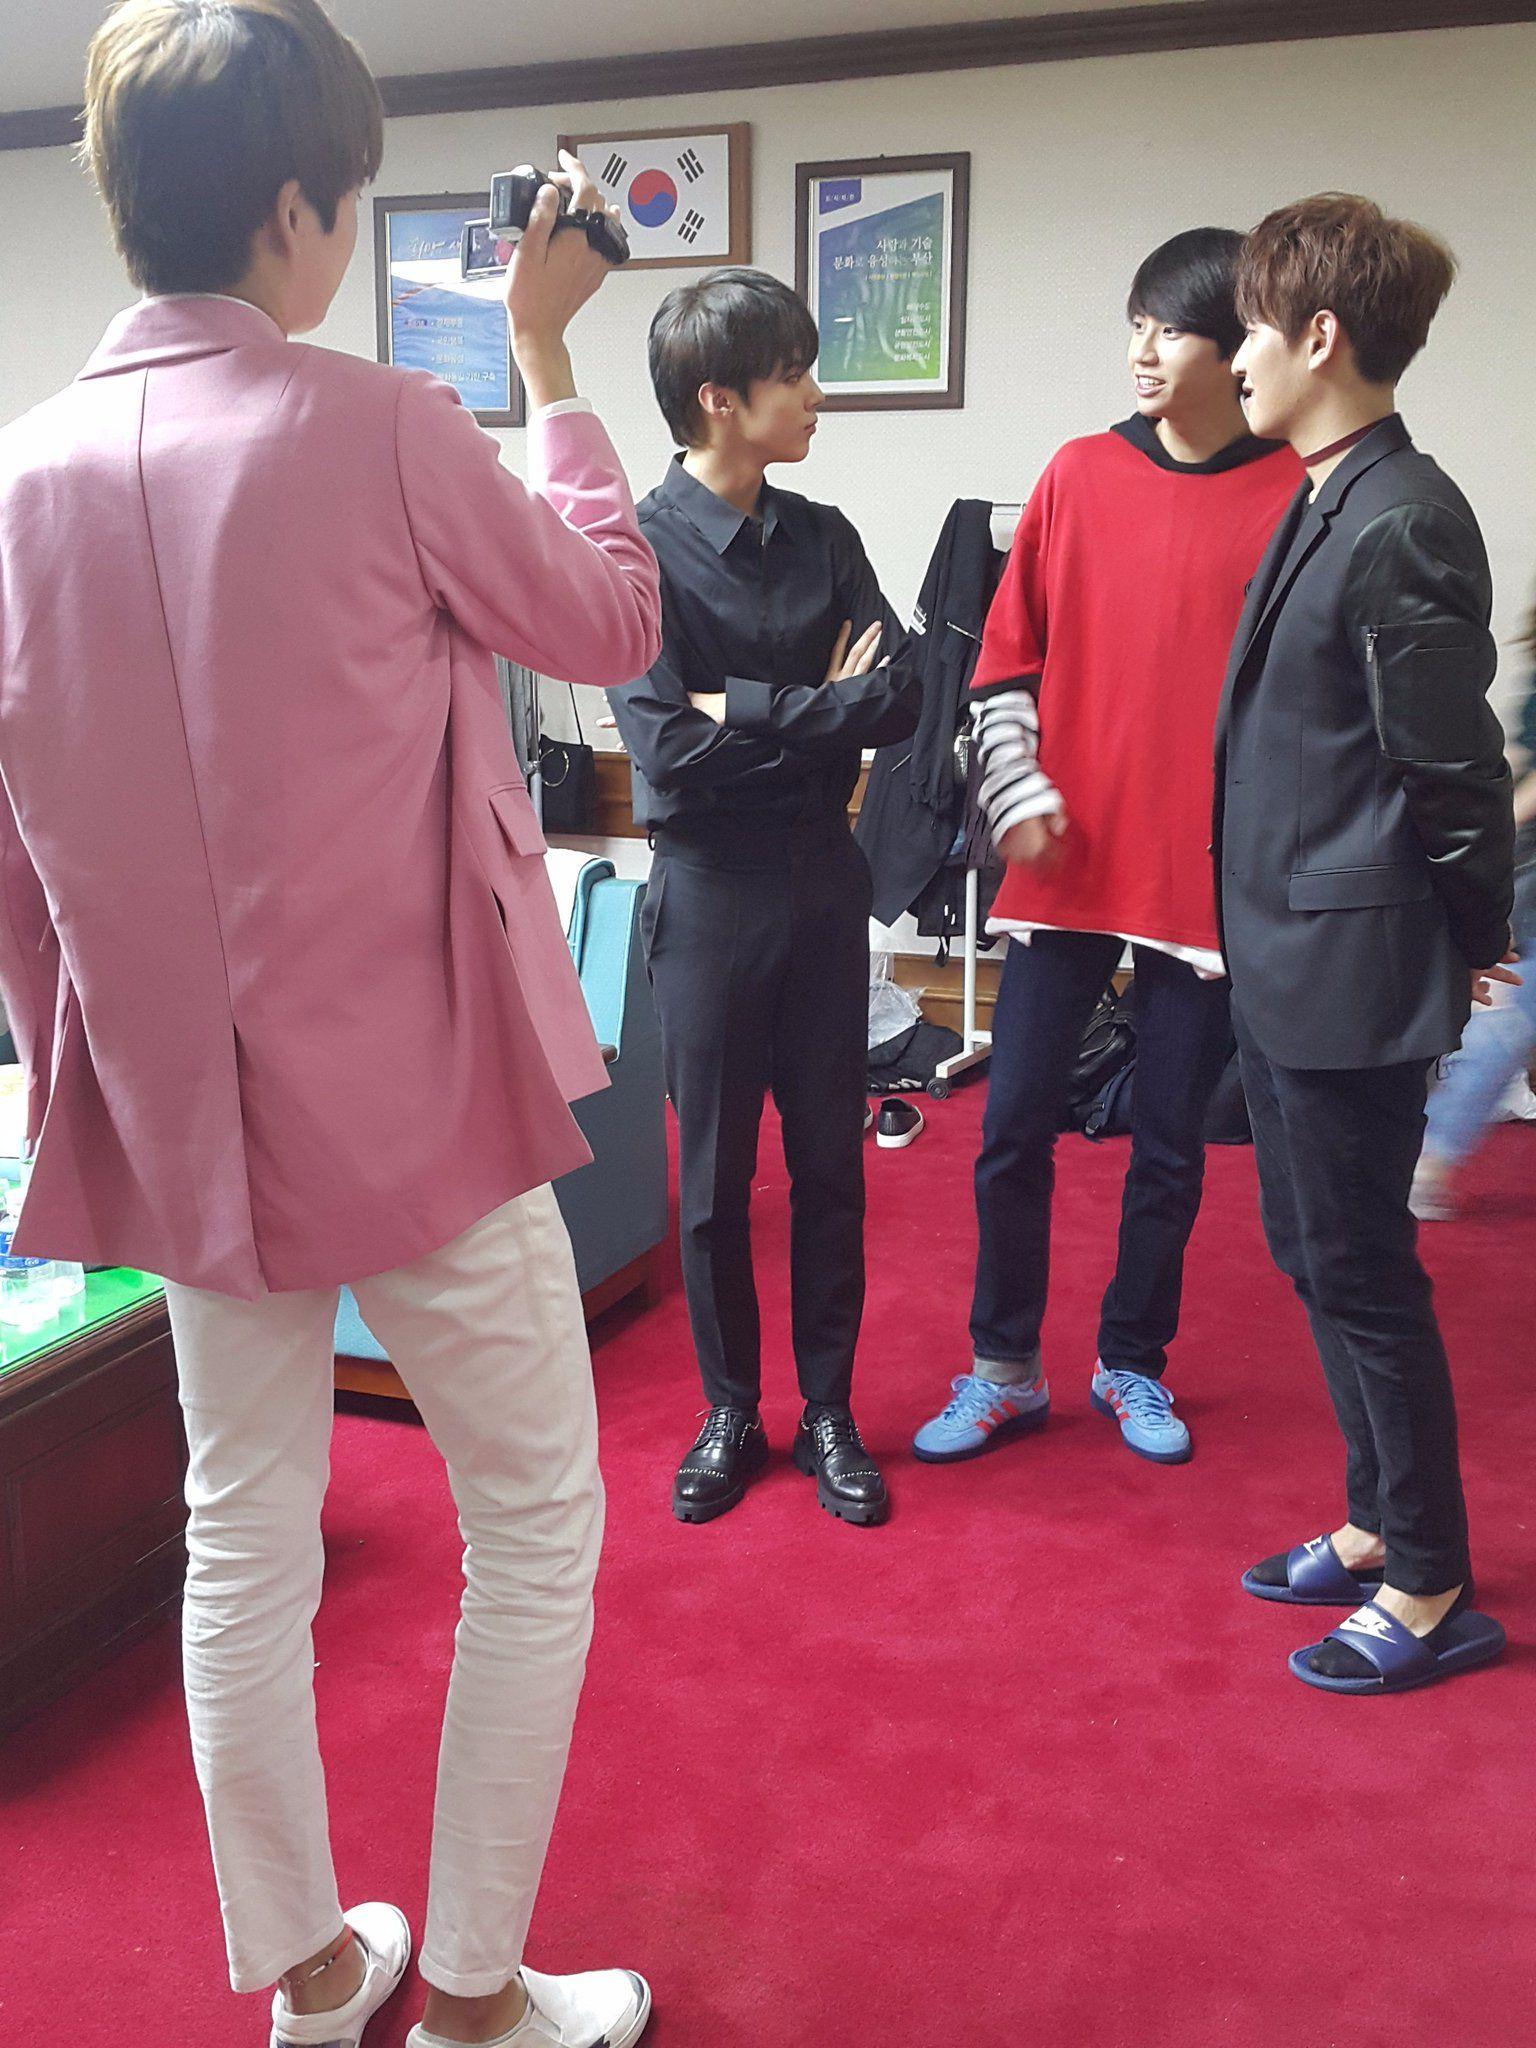 161021 UP10TION Wooshin | Wei & Kogyeol #UP10TION #업텐션 #Wooshin #우신  #Kogyeol #고결  #Wei #웨이